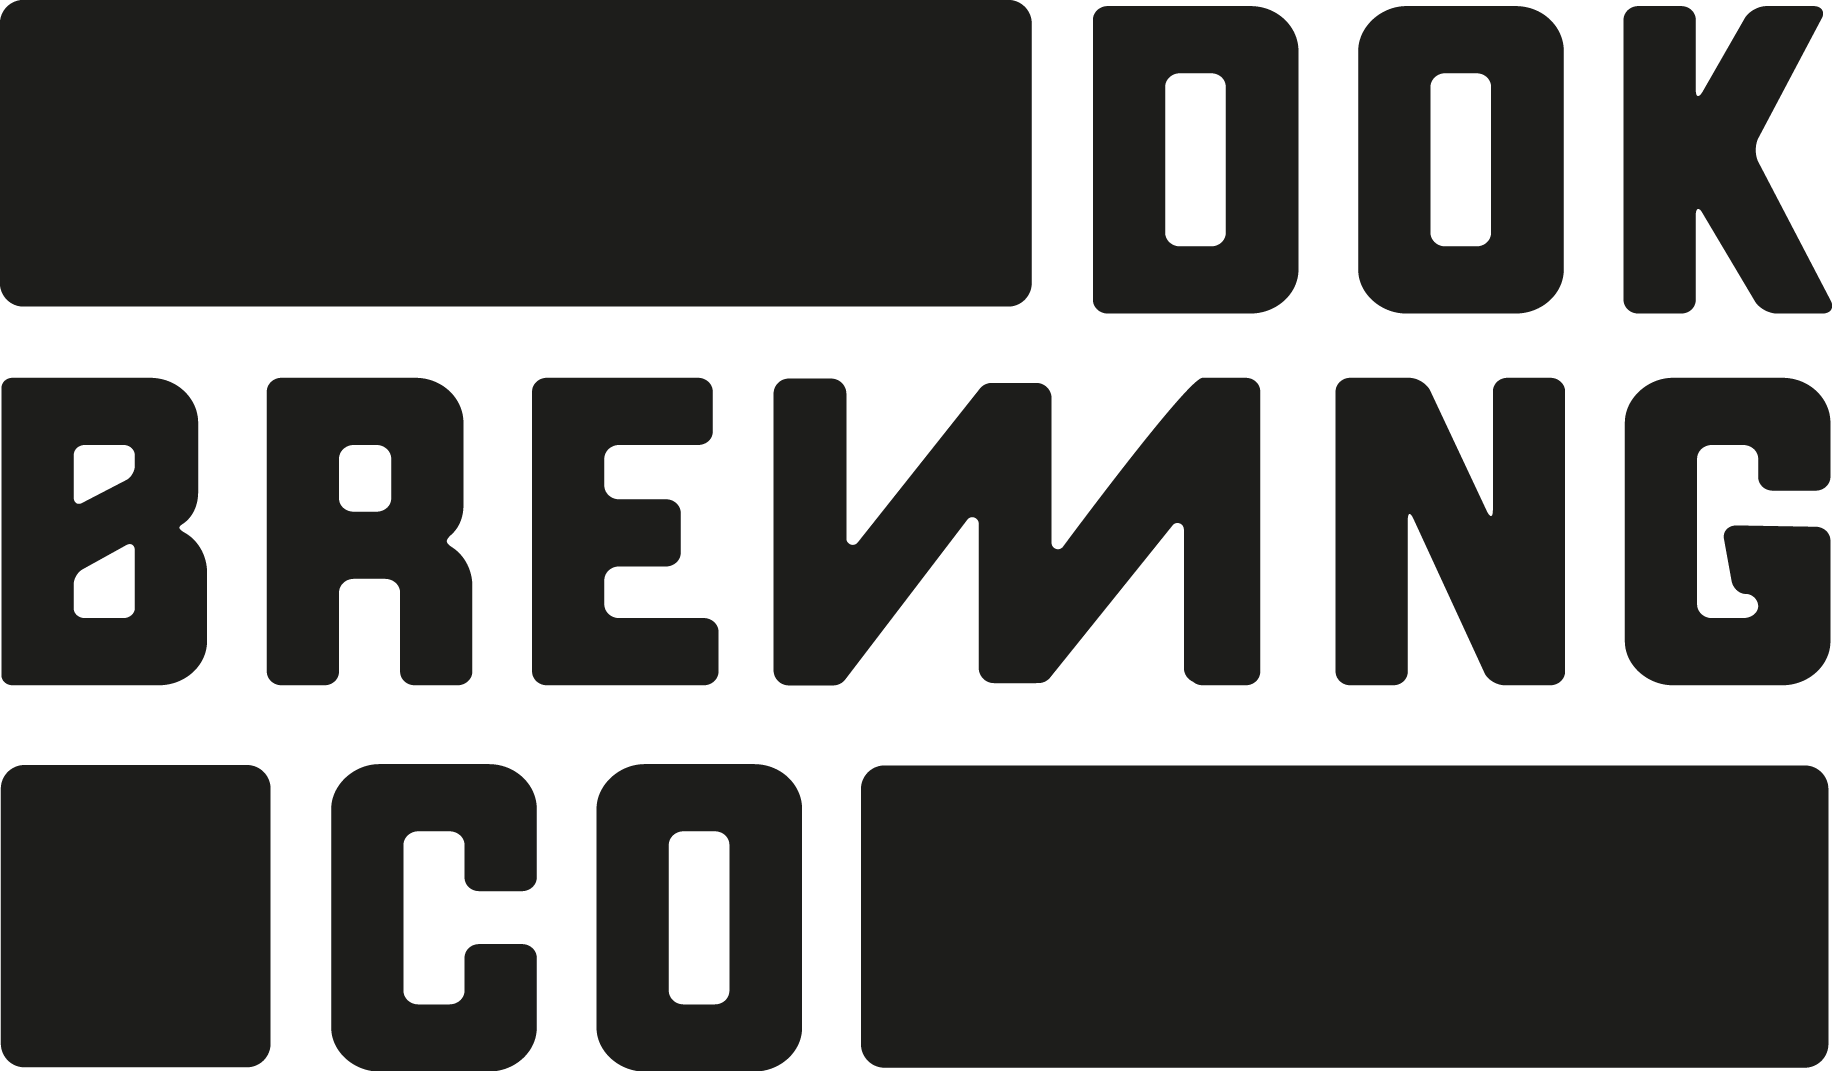 Dok Brewing Company